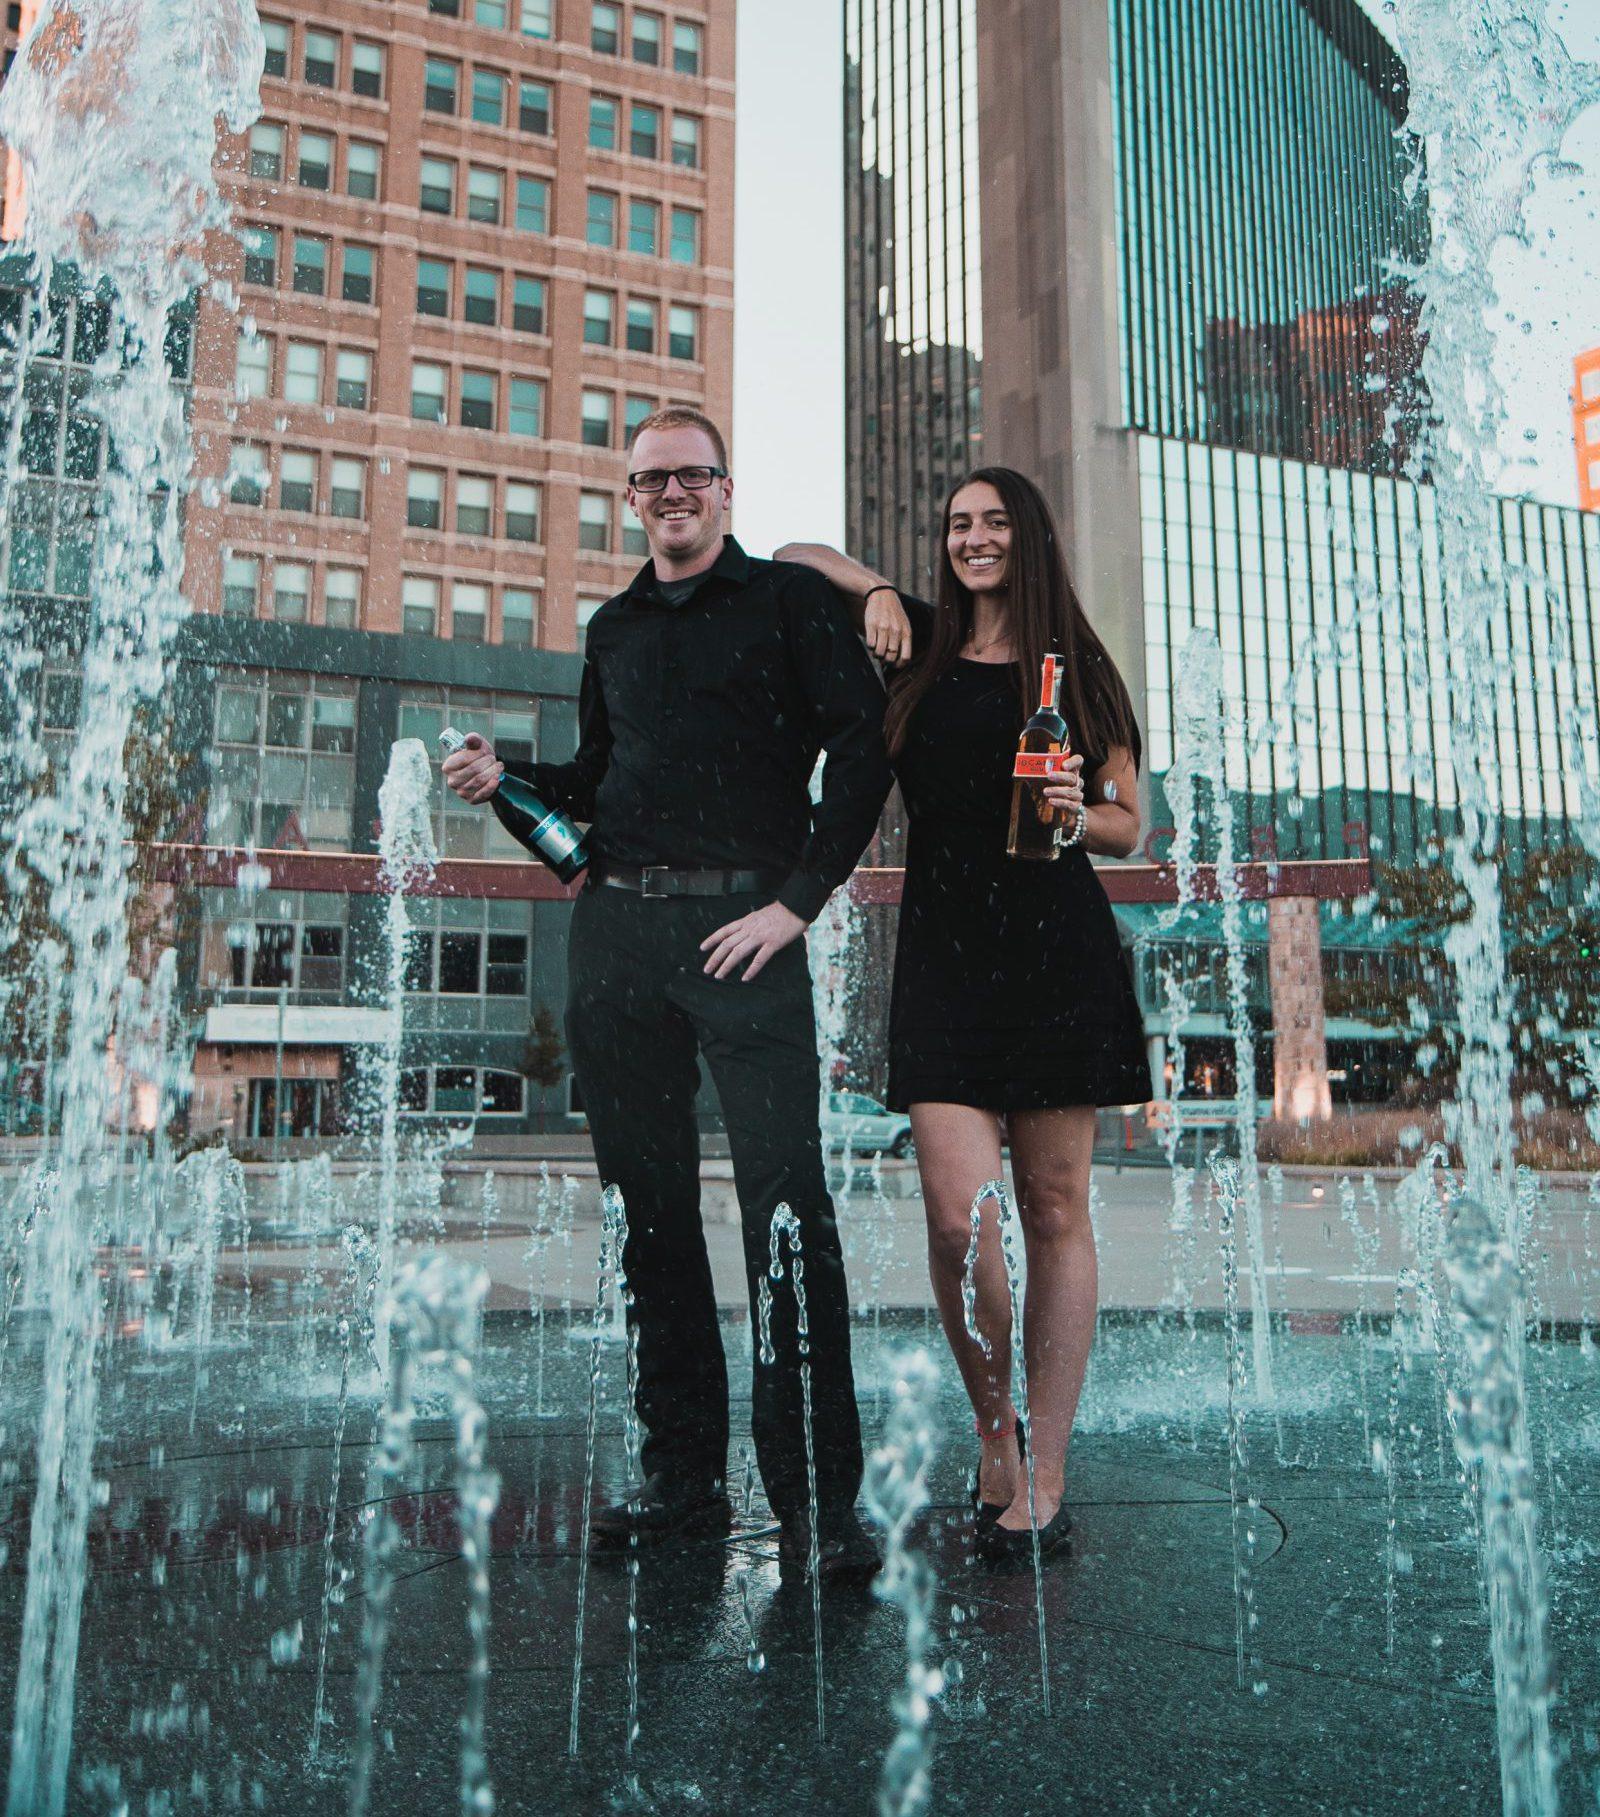 Premier Pour Bartending owner and bartender modeling in downtown Toledo